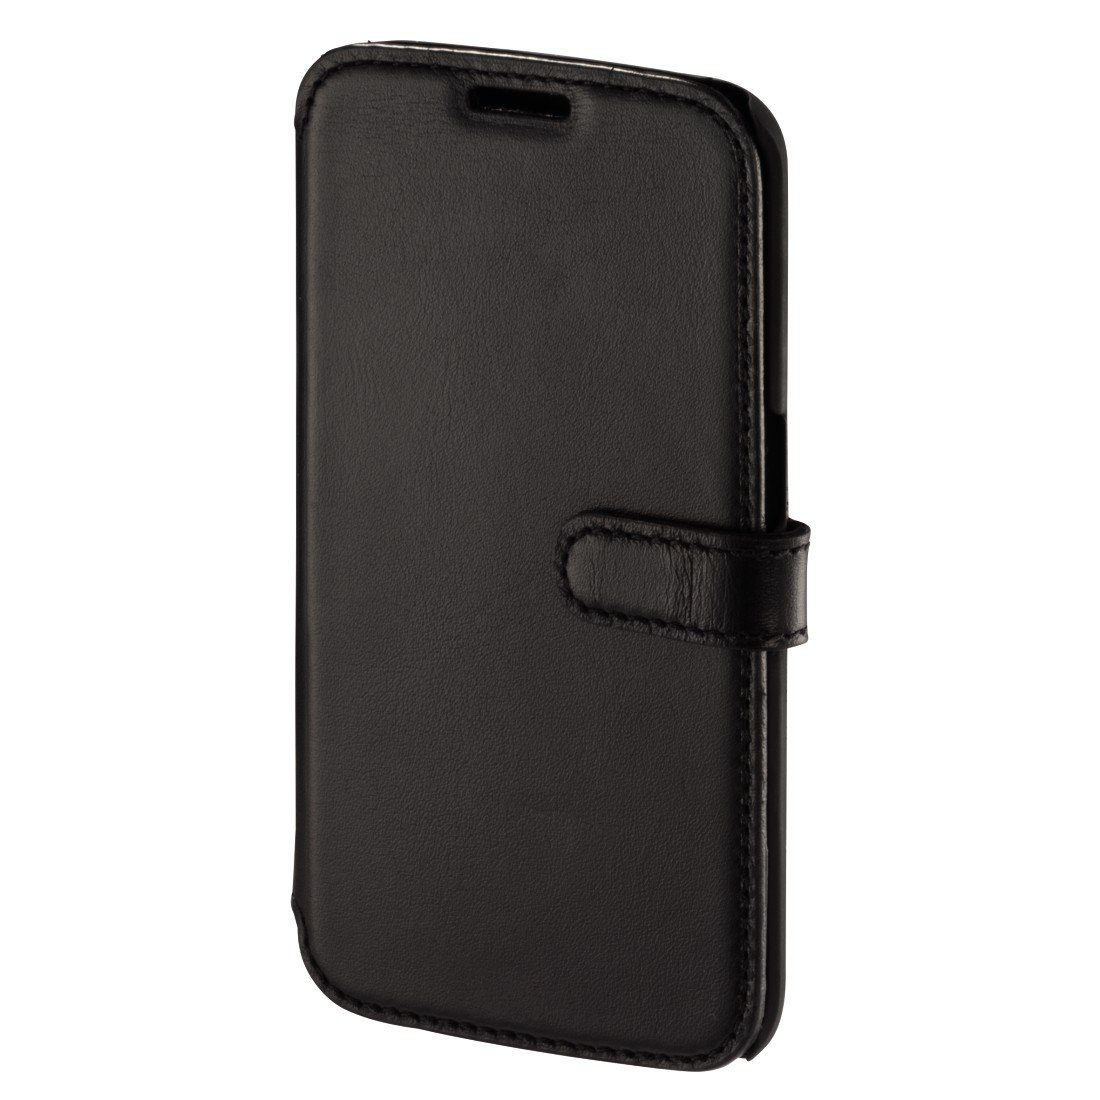 Hama Portfolio Prime Line für Samsung Galaxy S6 Edge, Nappa-Schwarz